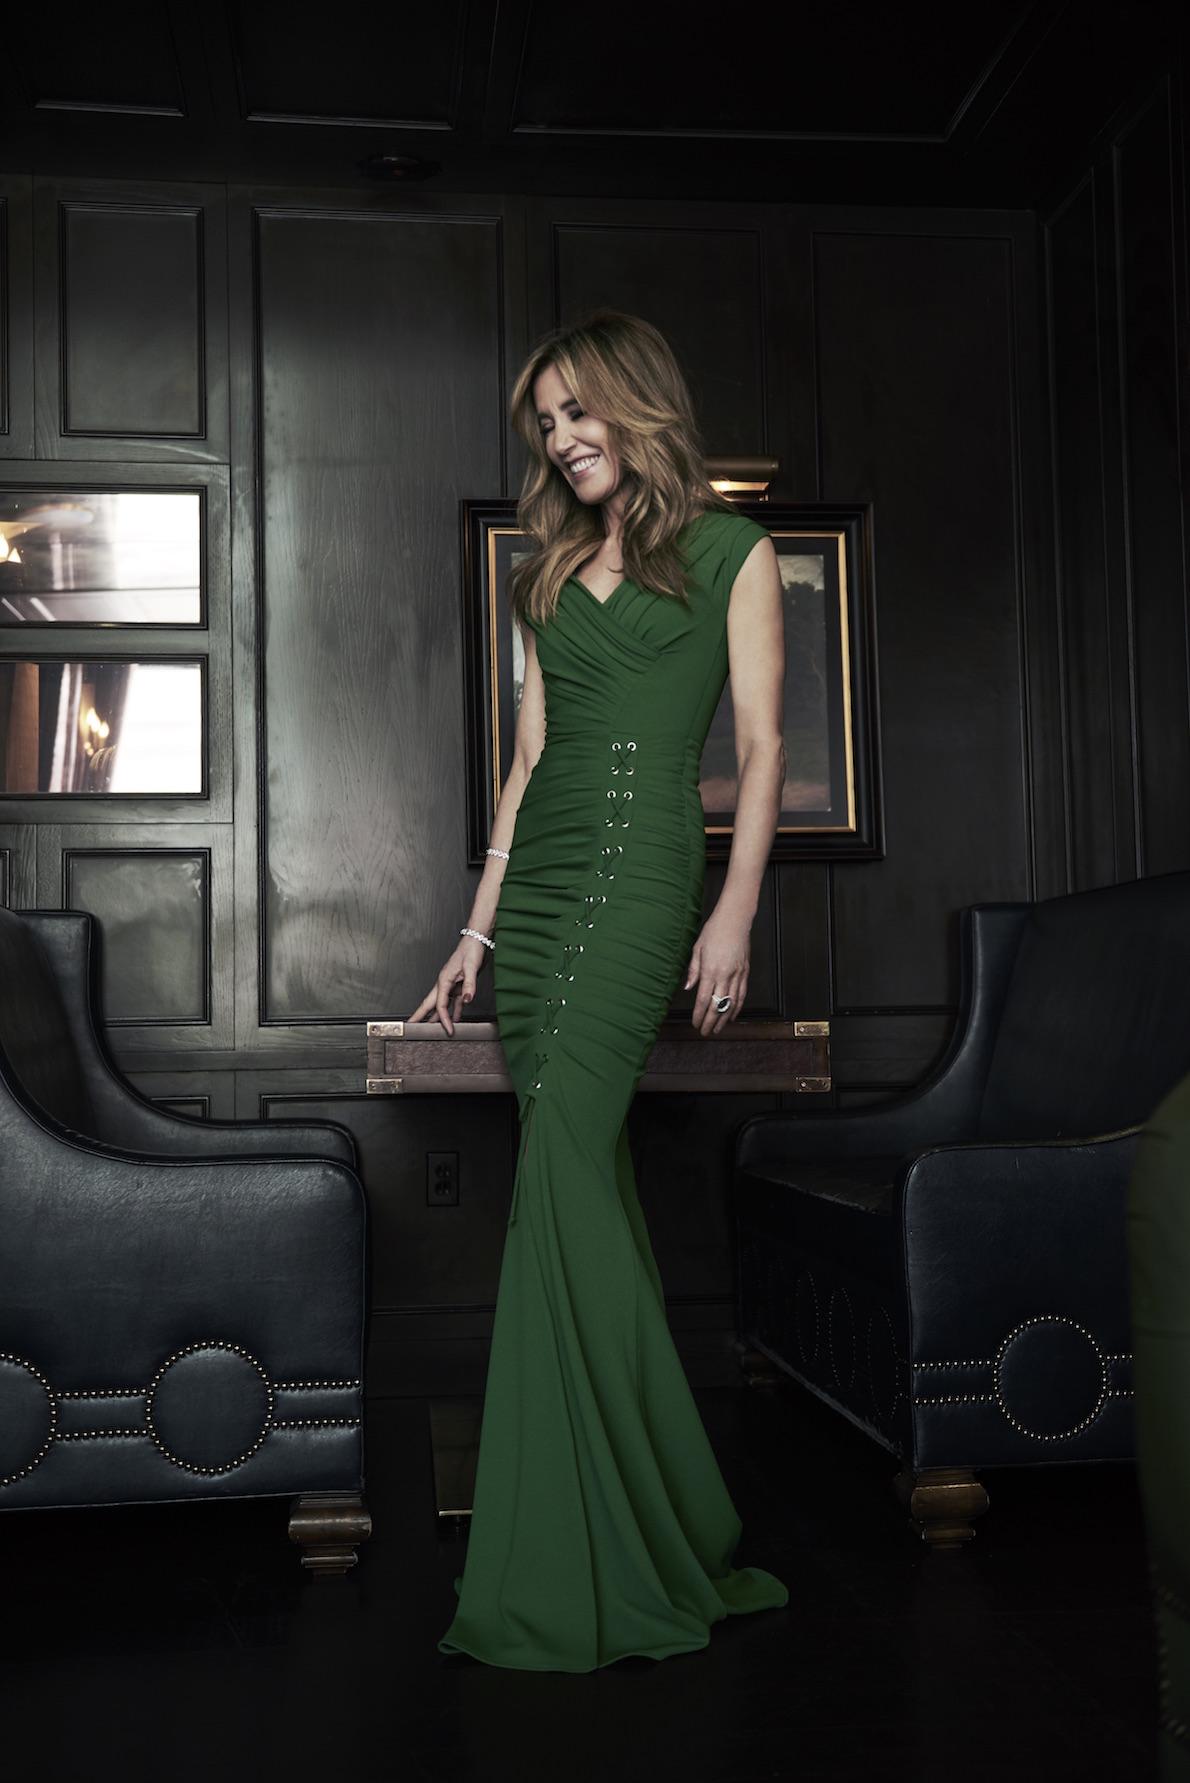 Gown: Julea Domani by Zeena Zaki Jewels: Martin Katz